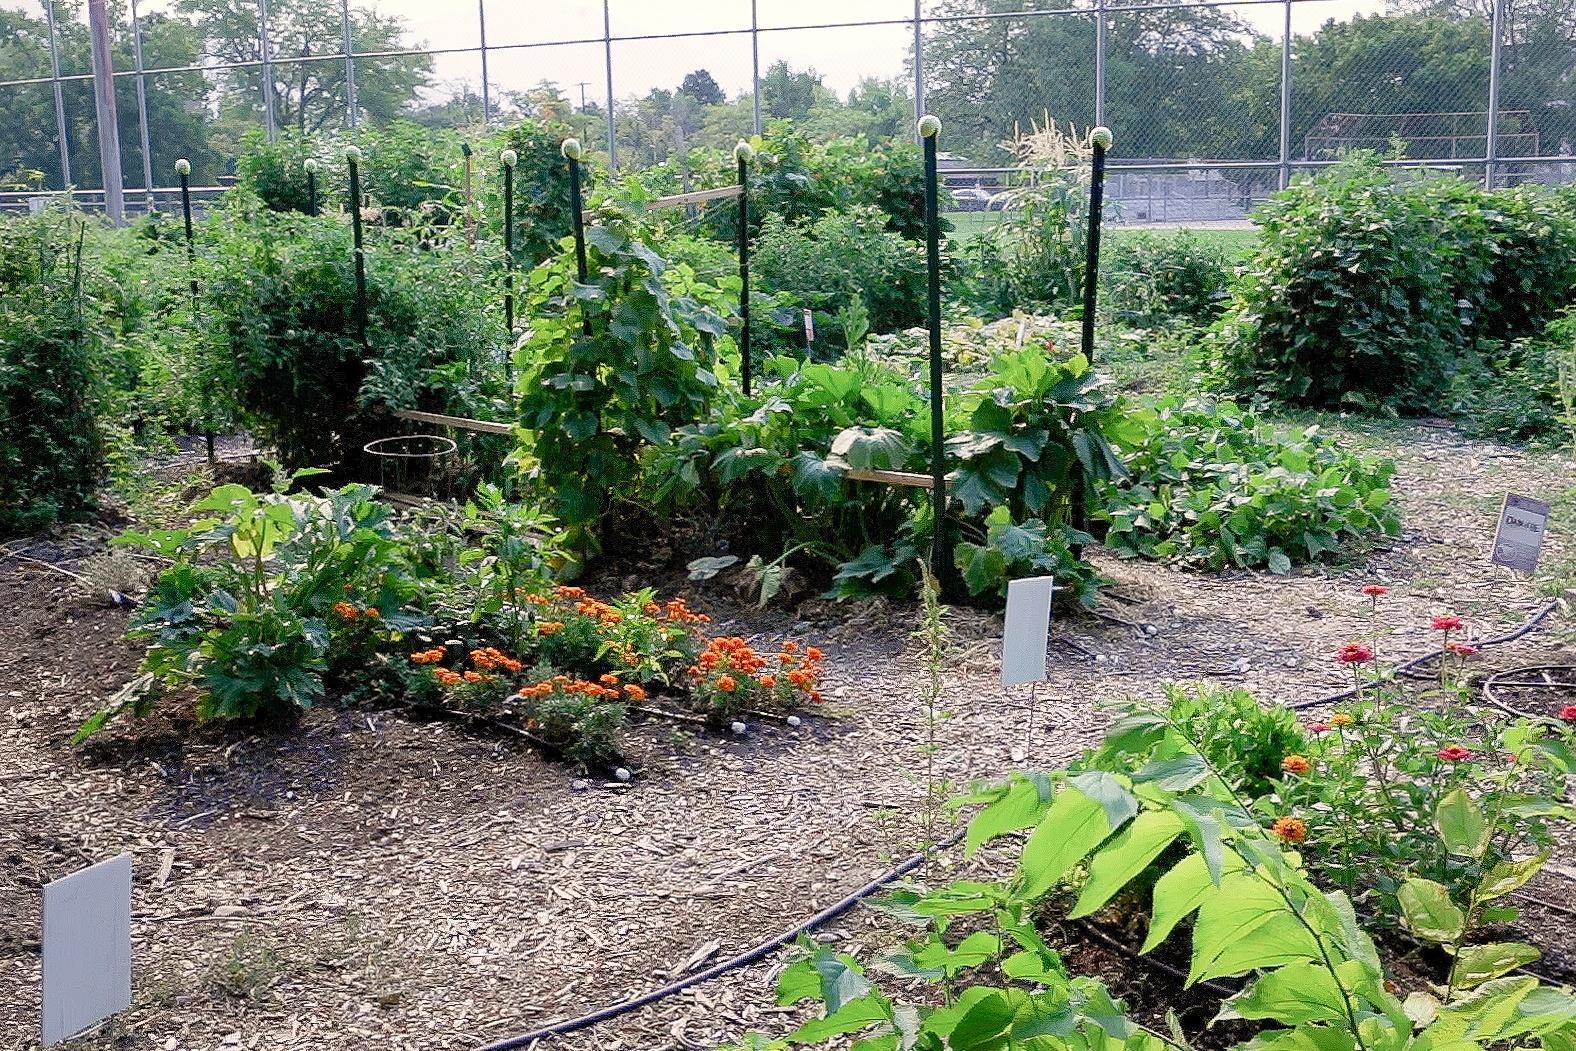 New Roots' Harmony Garden